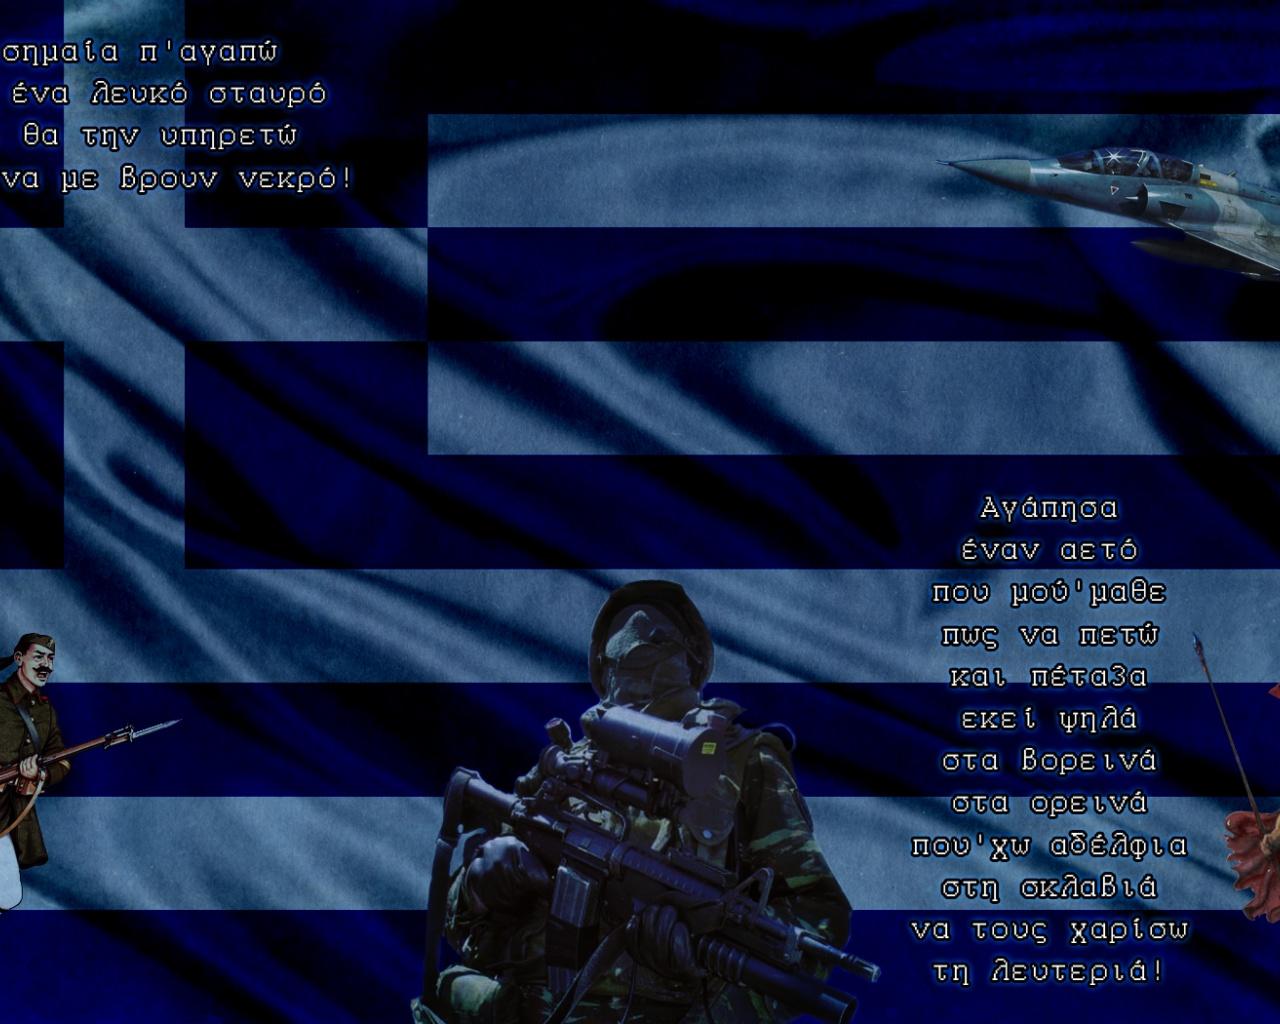 1280x1024 Greek army flag desktop PC and Mac wallpaper 1280x1024